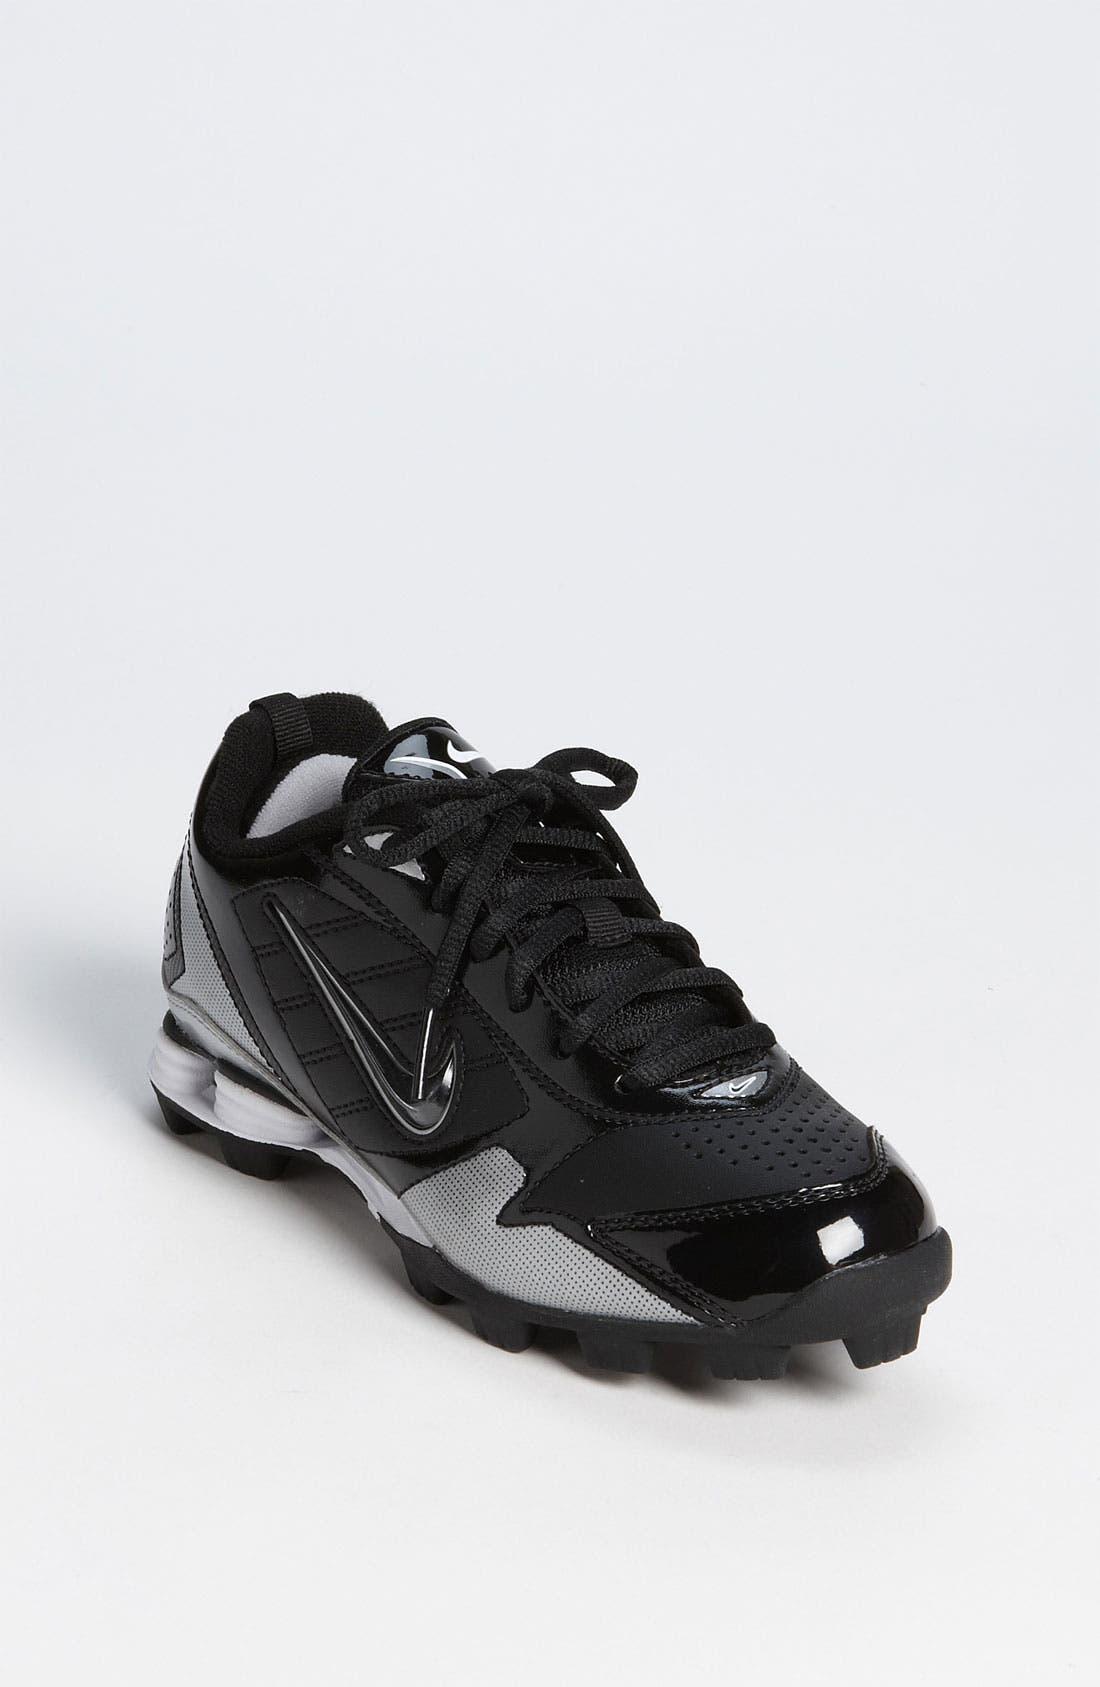 Main Image - Nike 'Fuse' Baseball Cleat (Toddler, Little Kid & Big Kid)